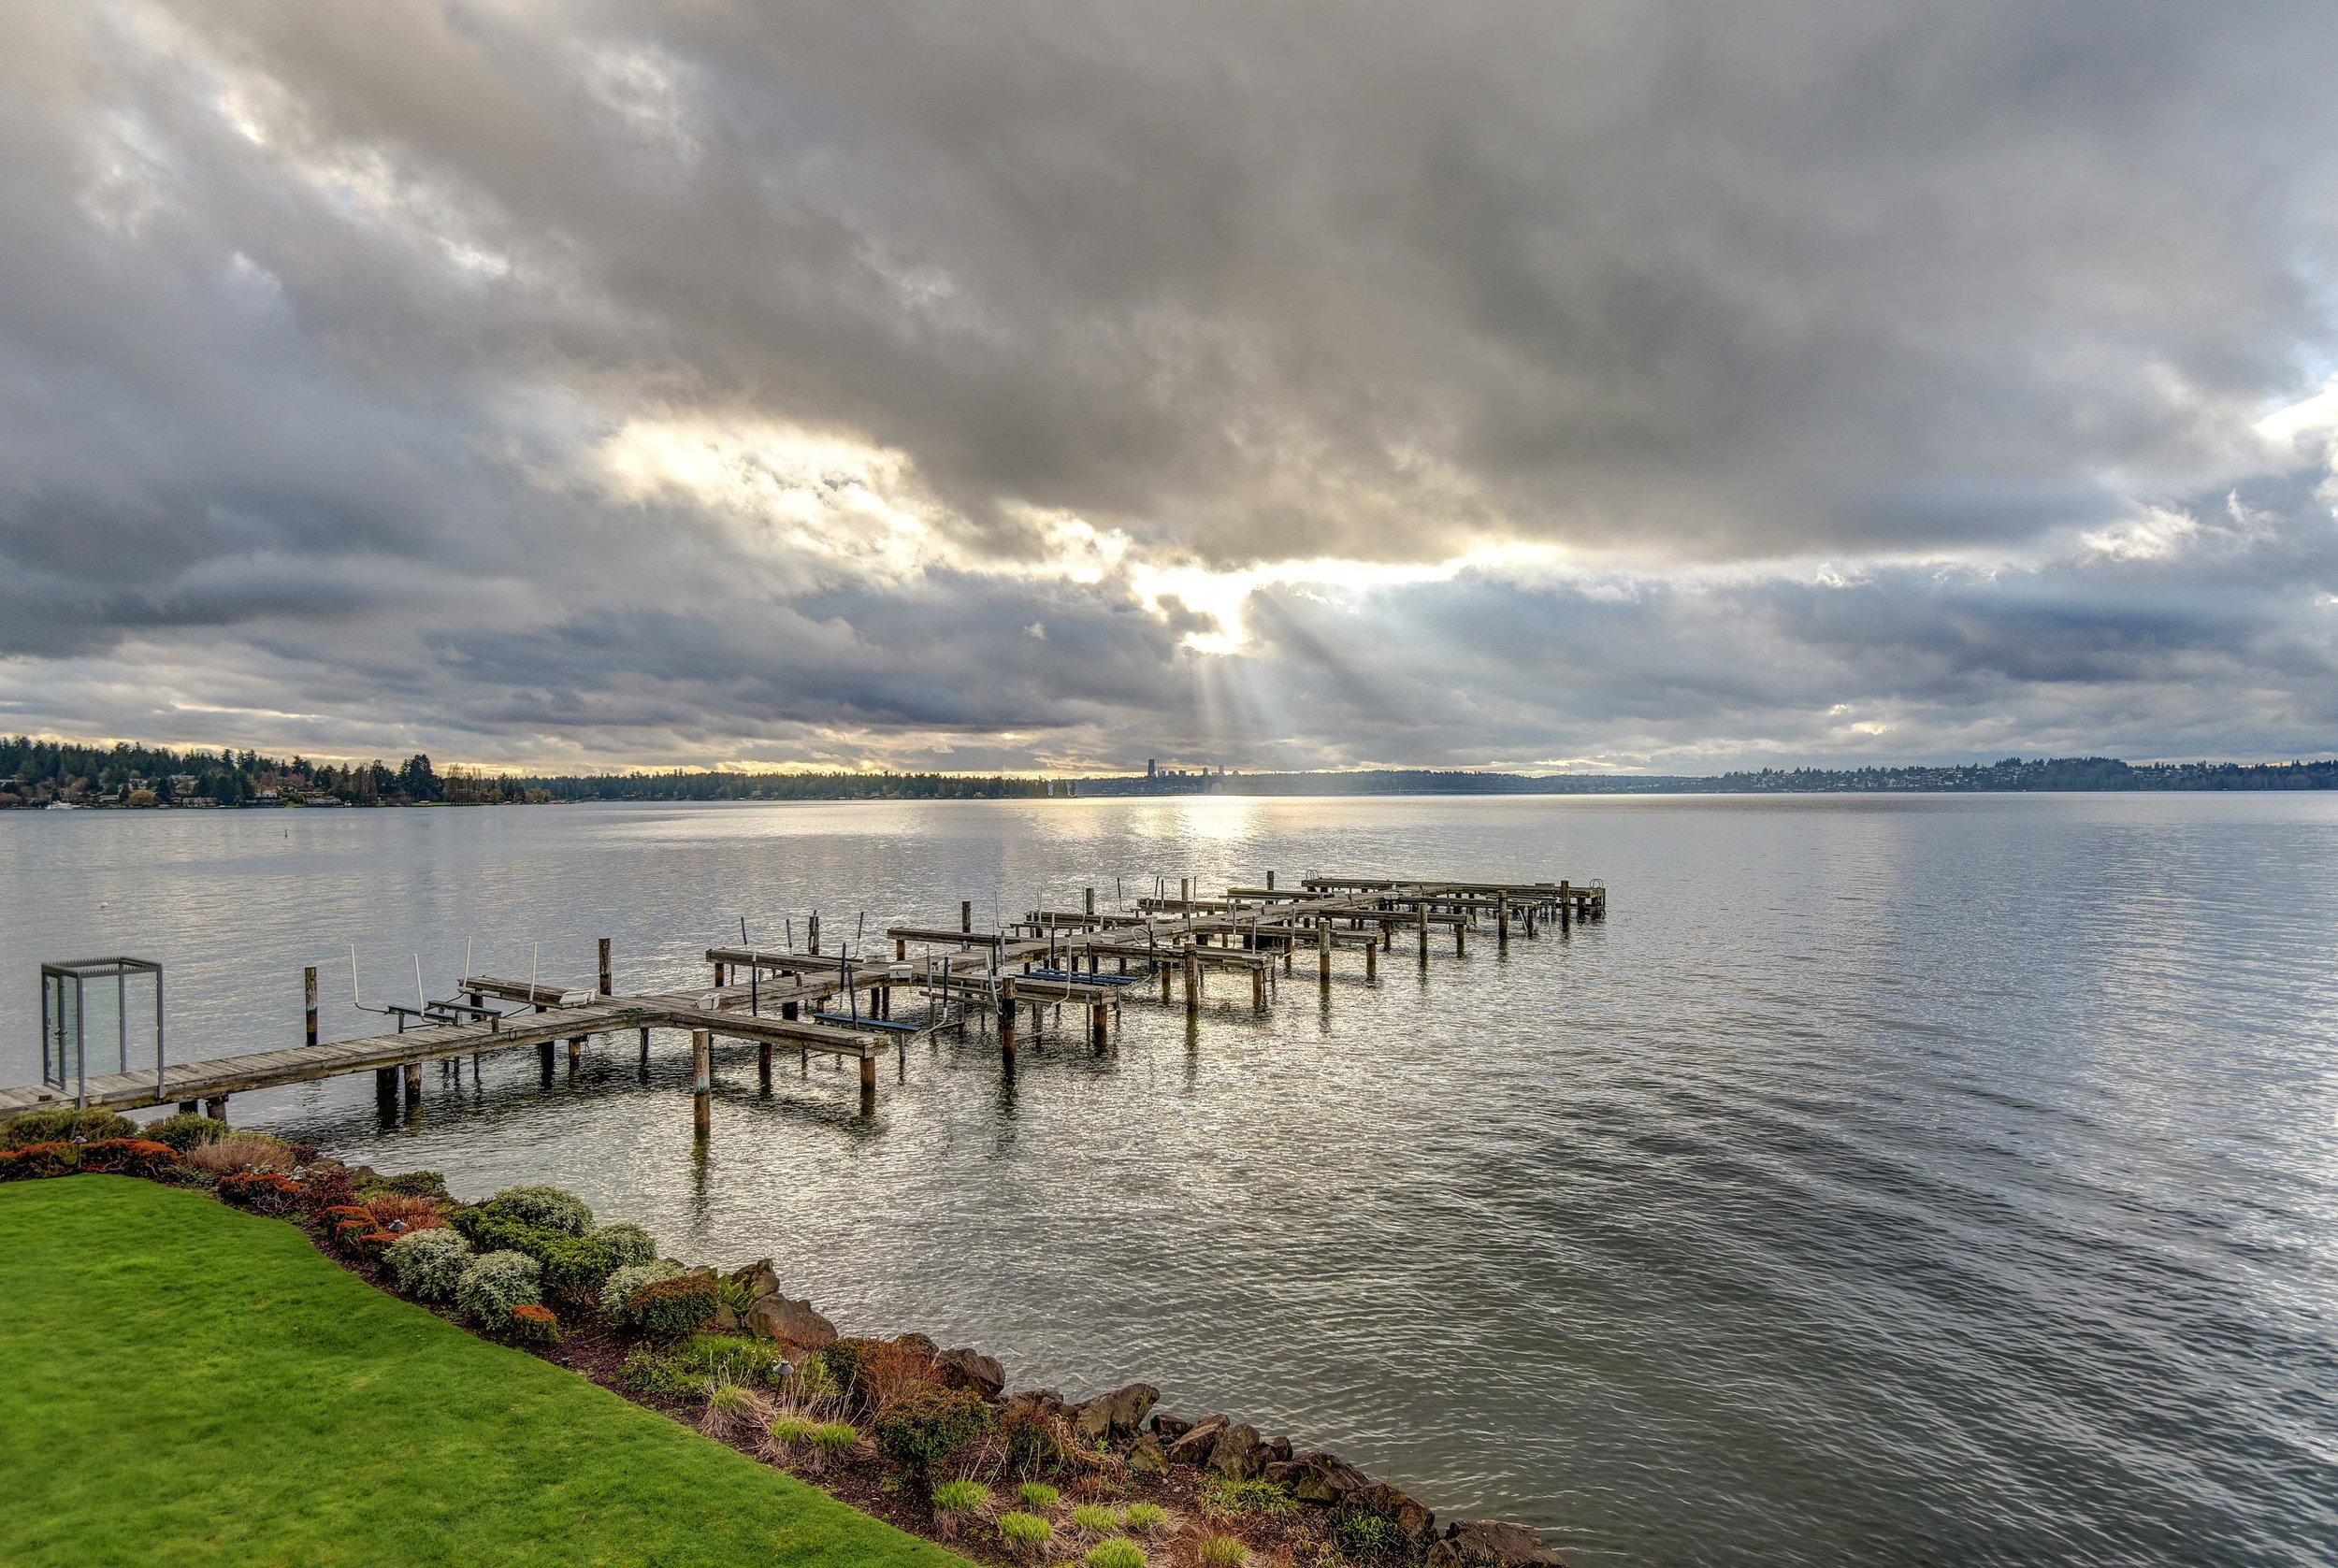 6401 Lake Washington Blvd NE-print-017-15-DENNON 6401AndyK 17-2700x1811-300dpi.jpg